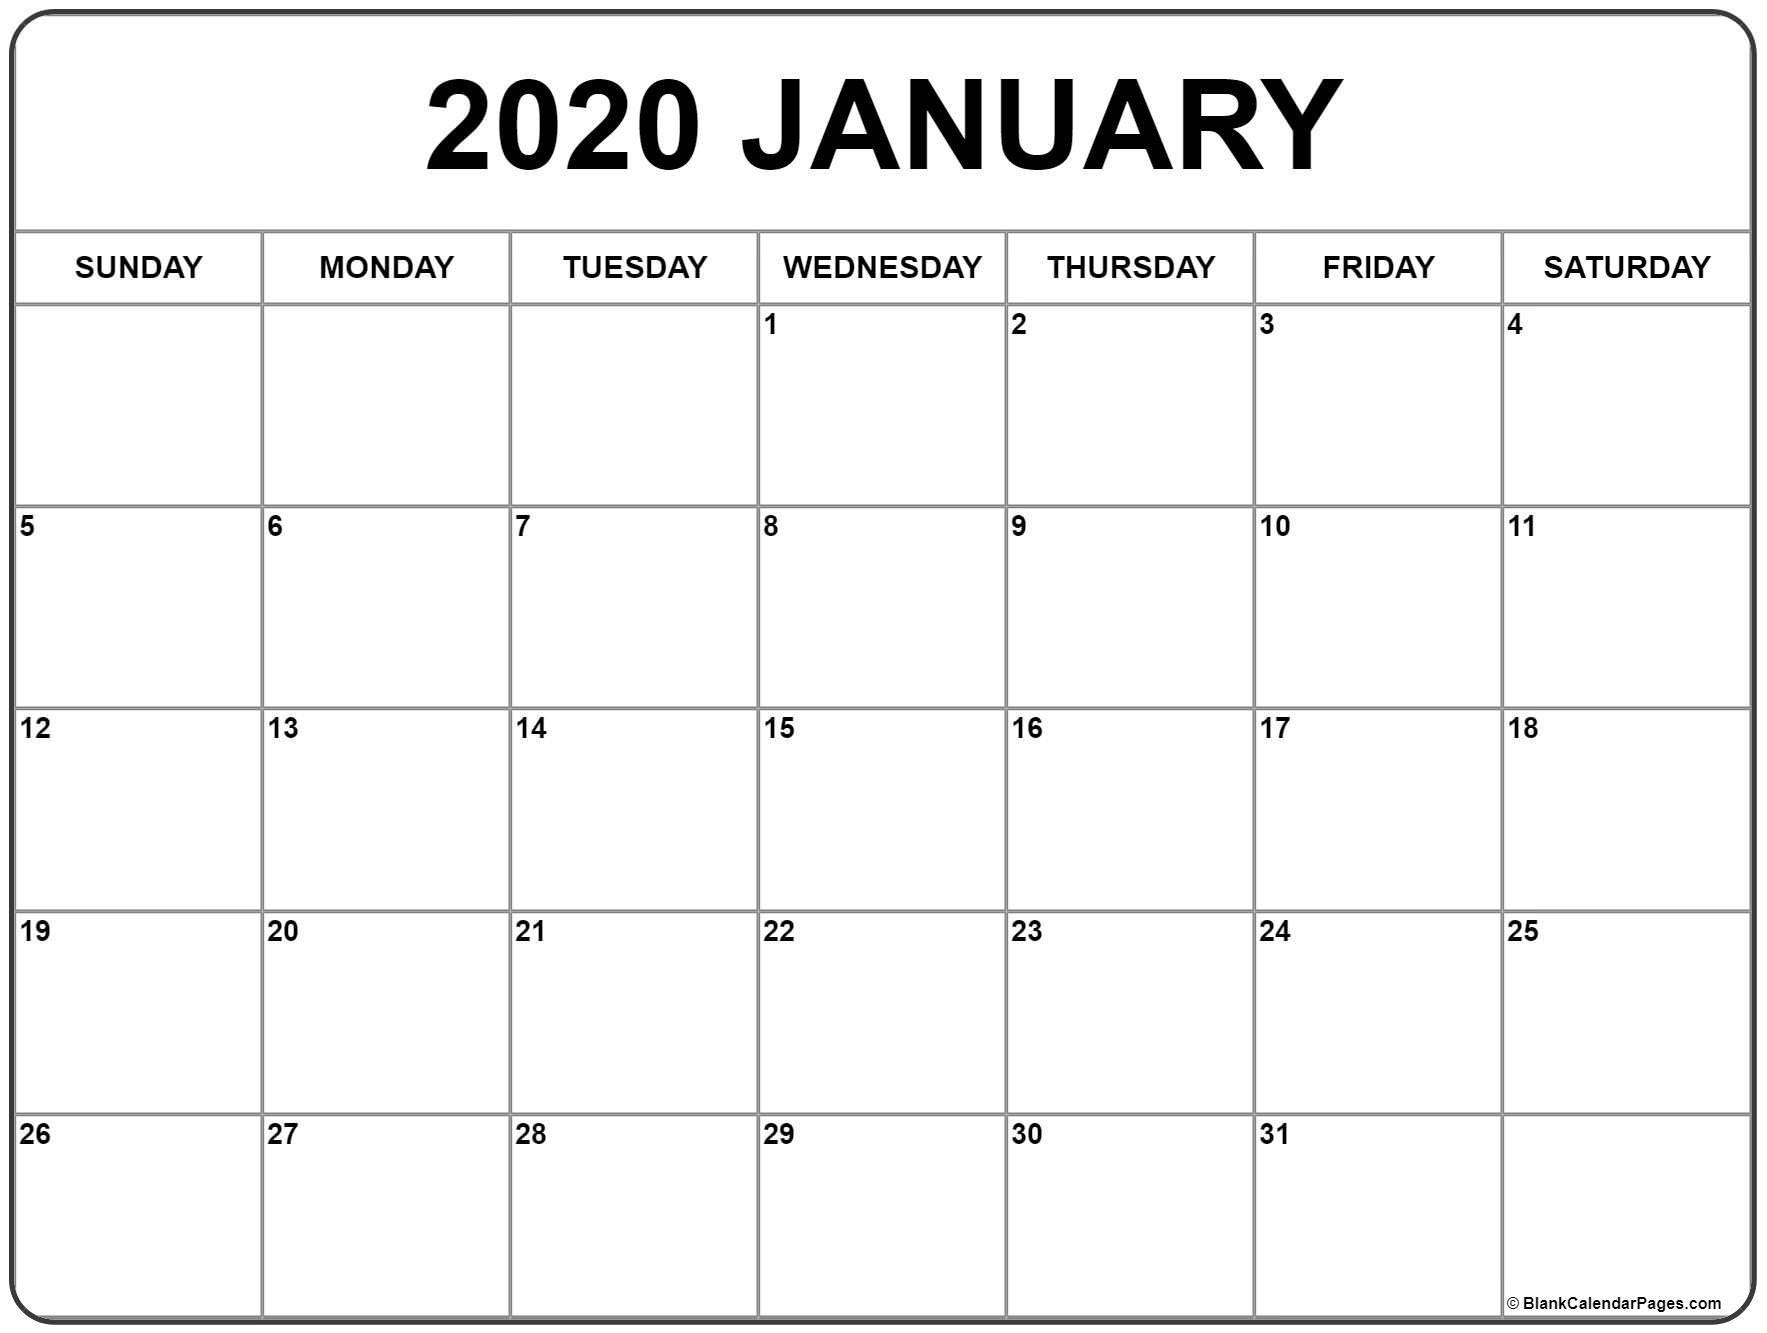 Calendar January 2020 Zodiac » Creative Calendar Ideas-January 2020 Calendar Drik Panchang